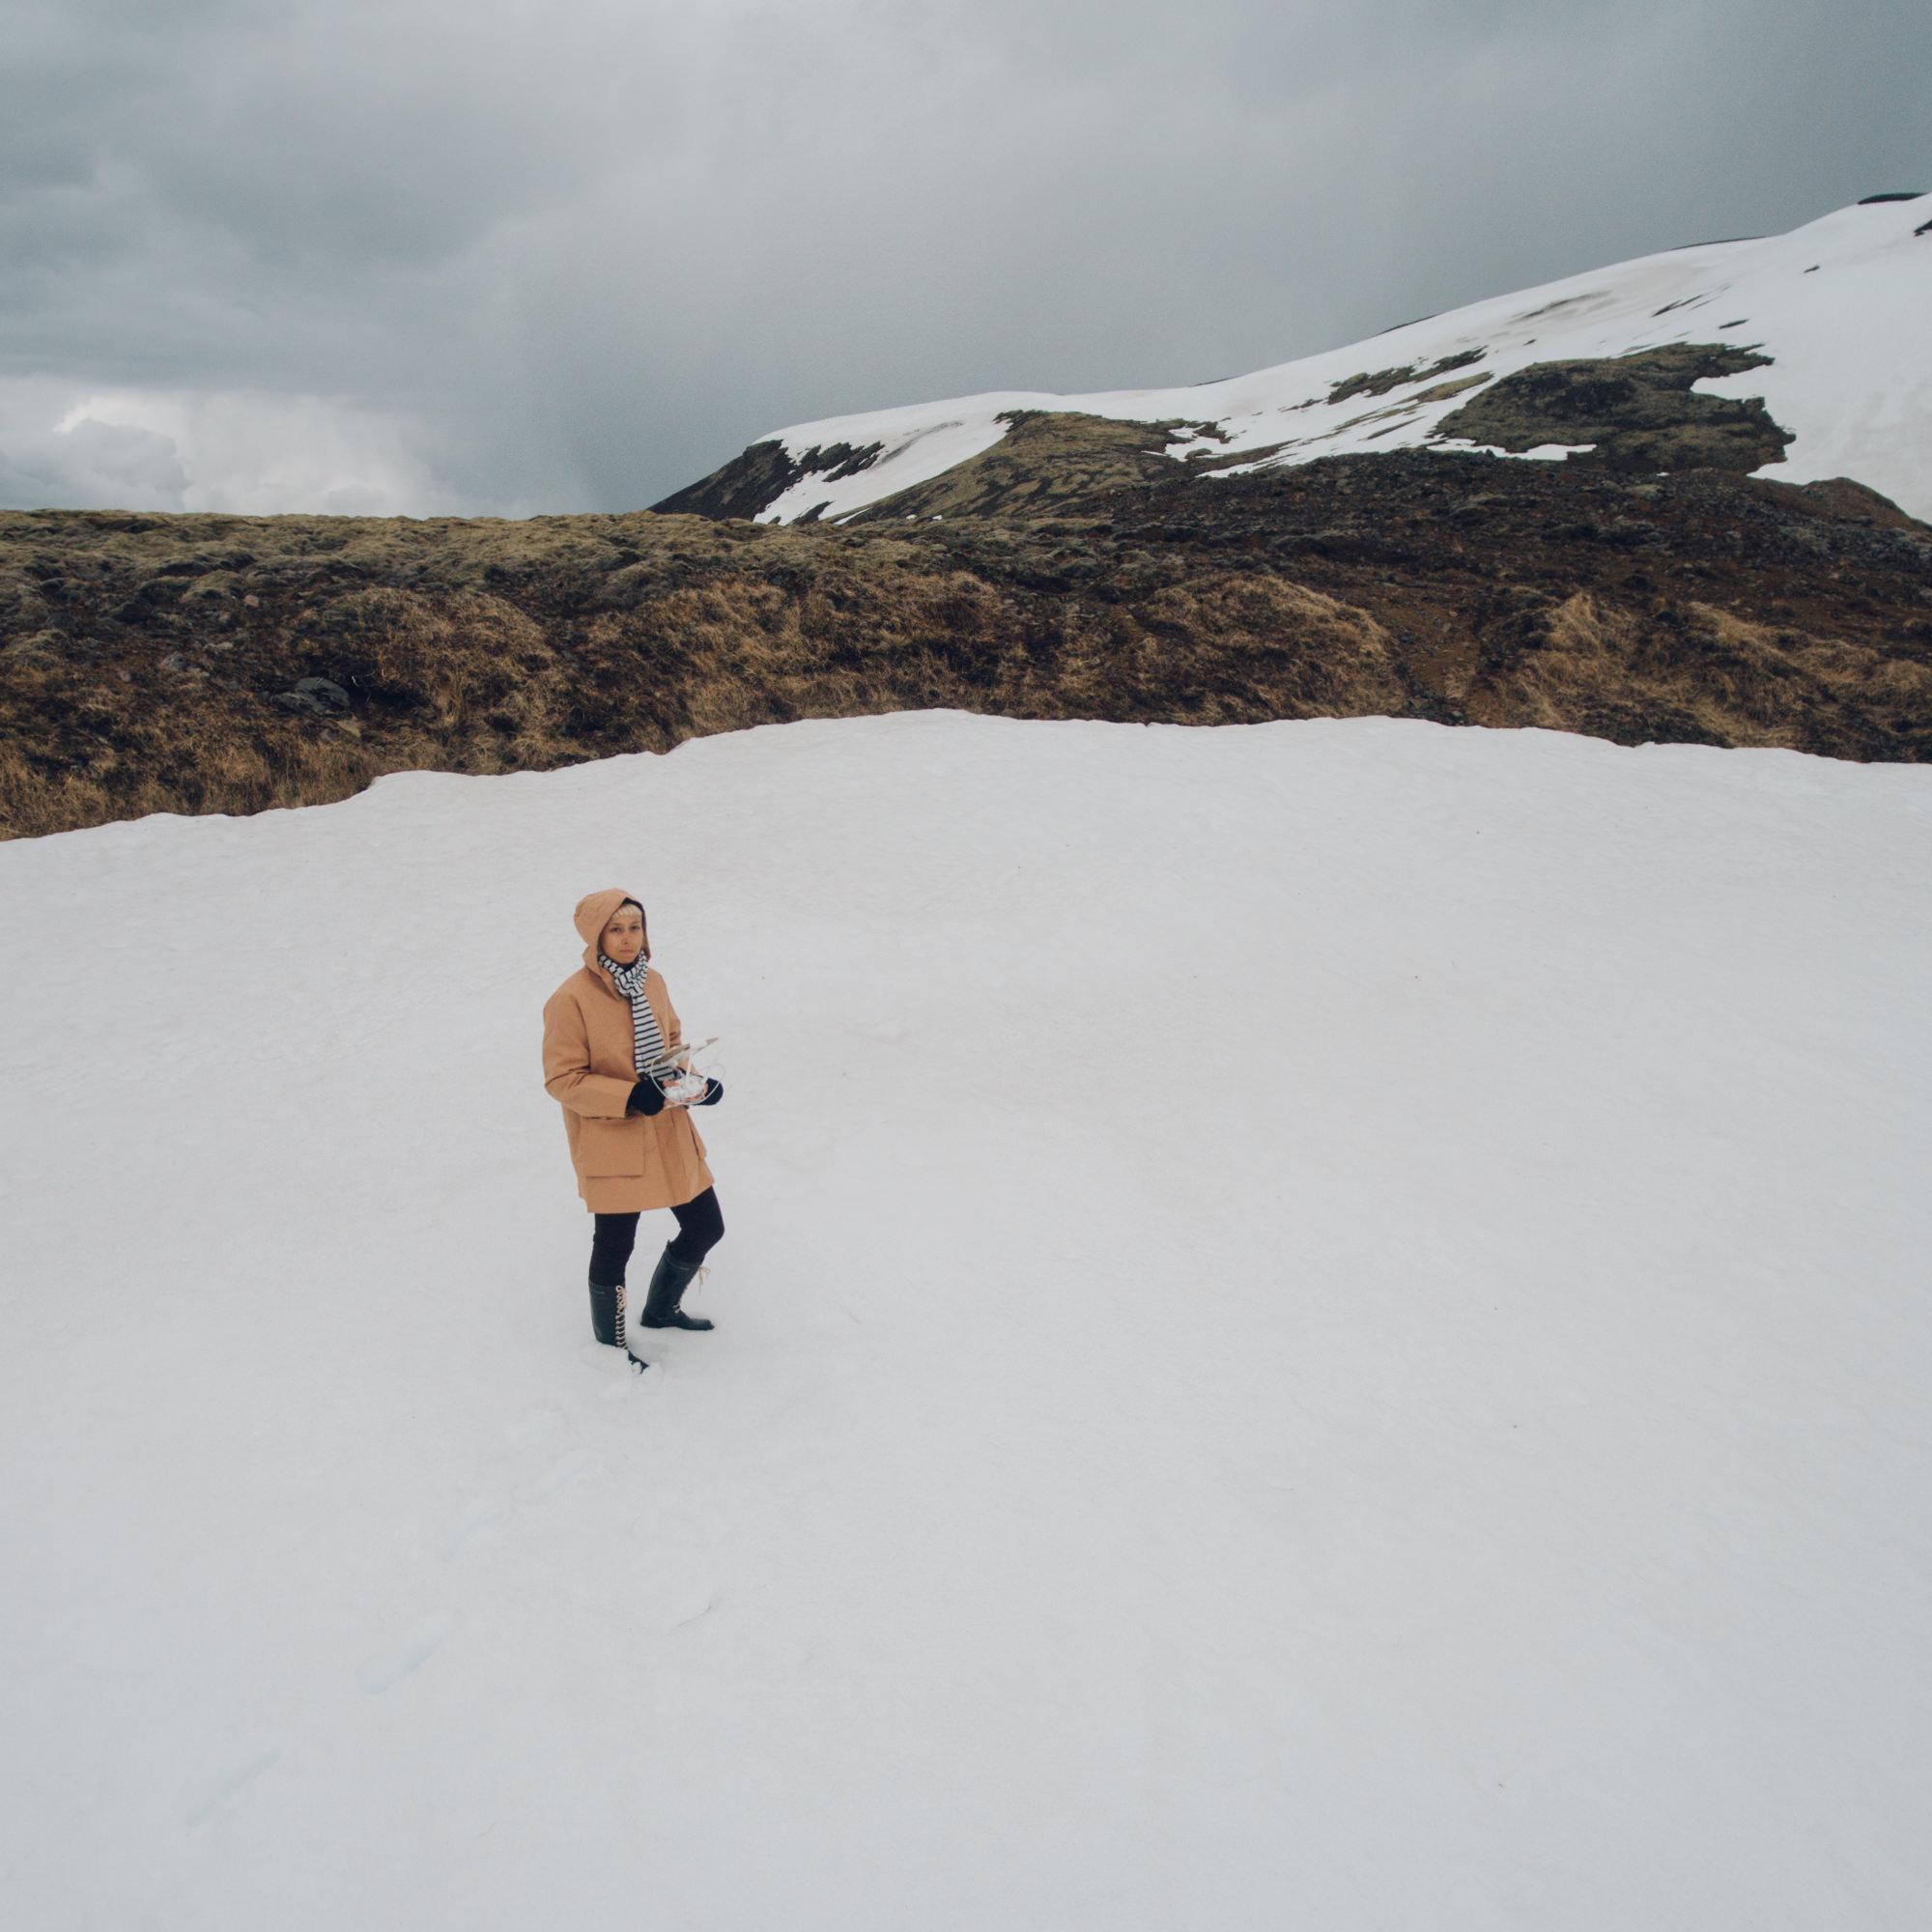 wrenee-iceland-part-1-7-snow-drone.jpg